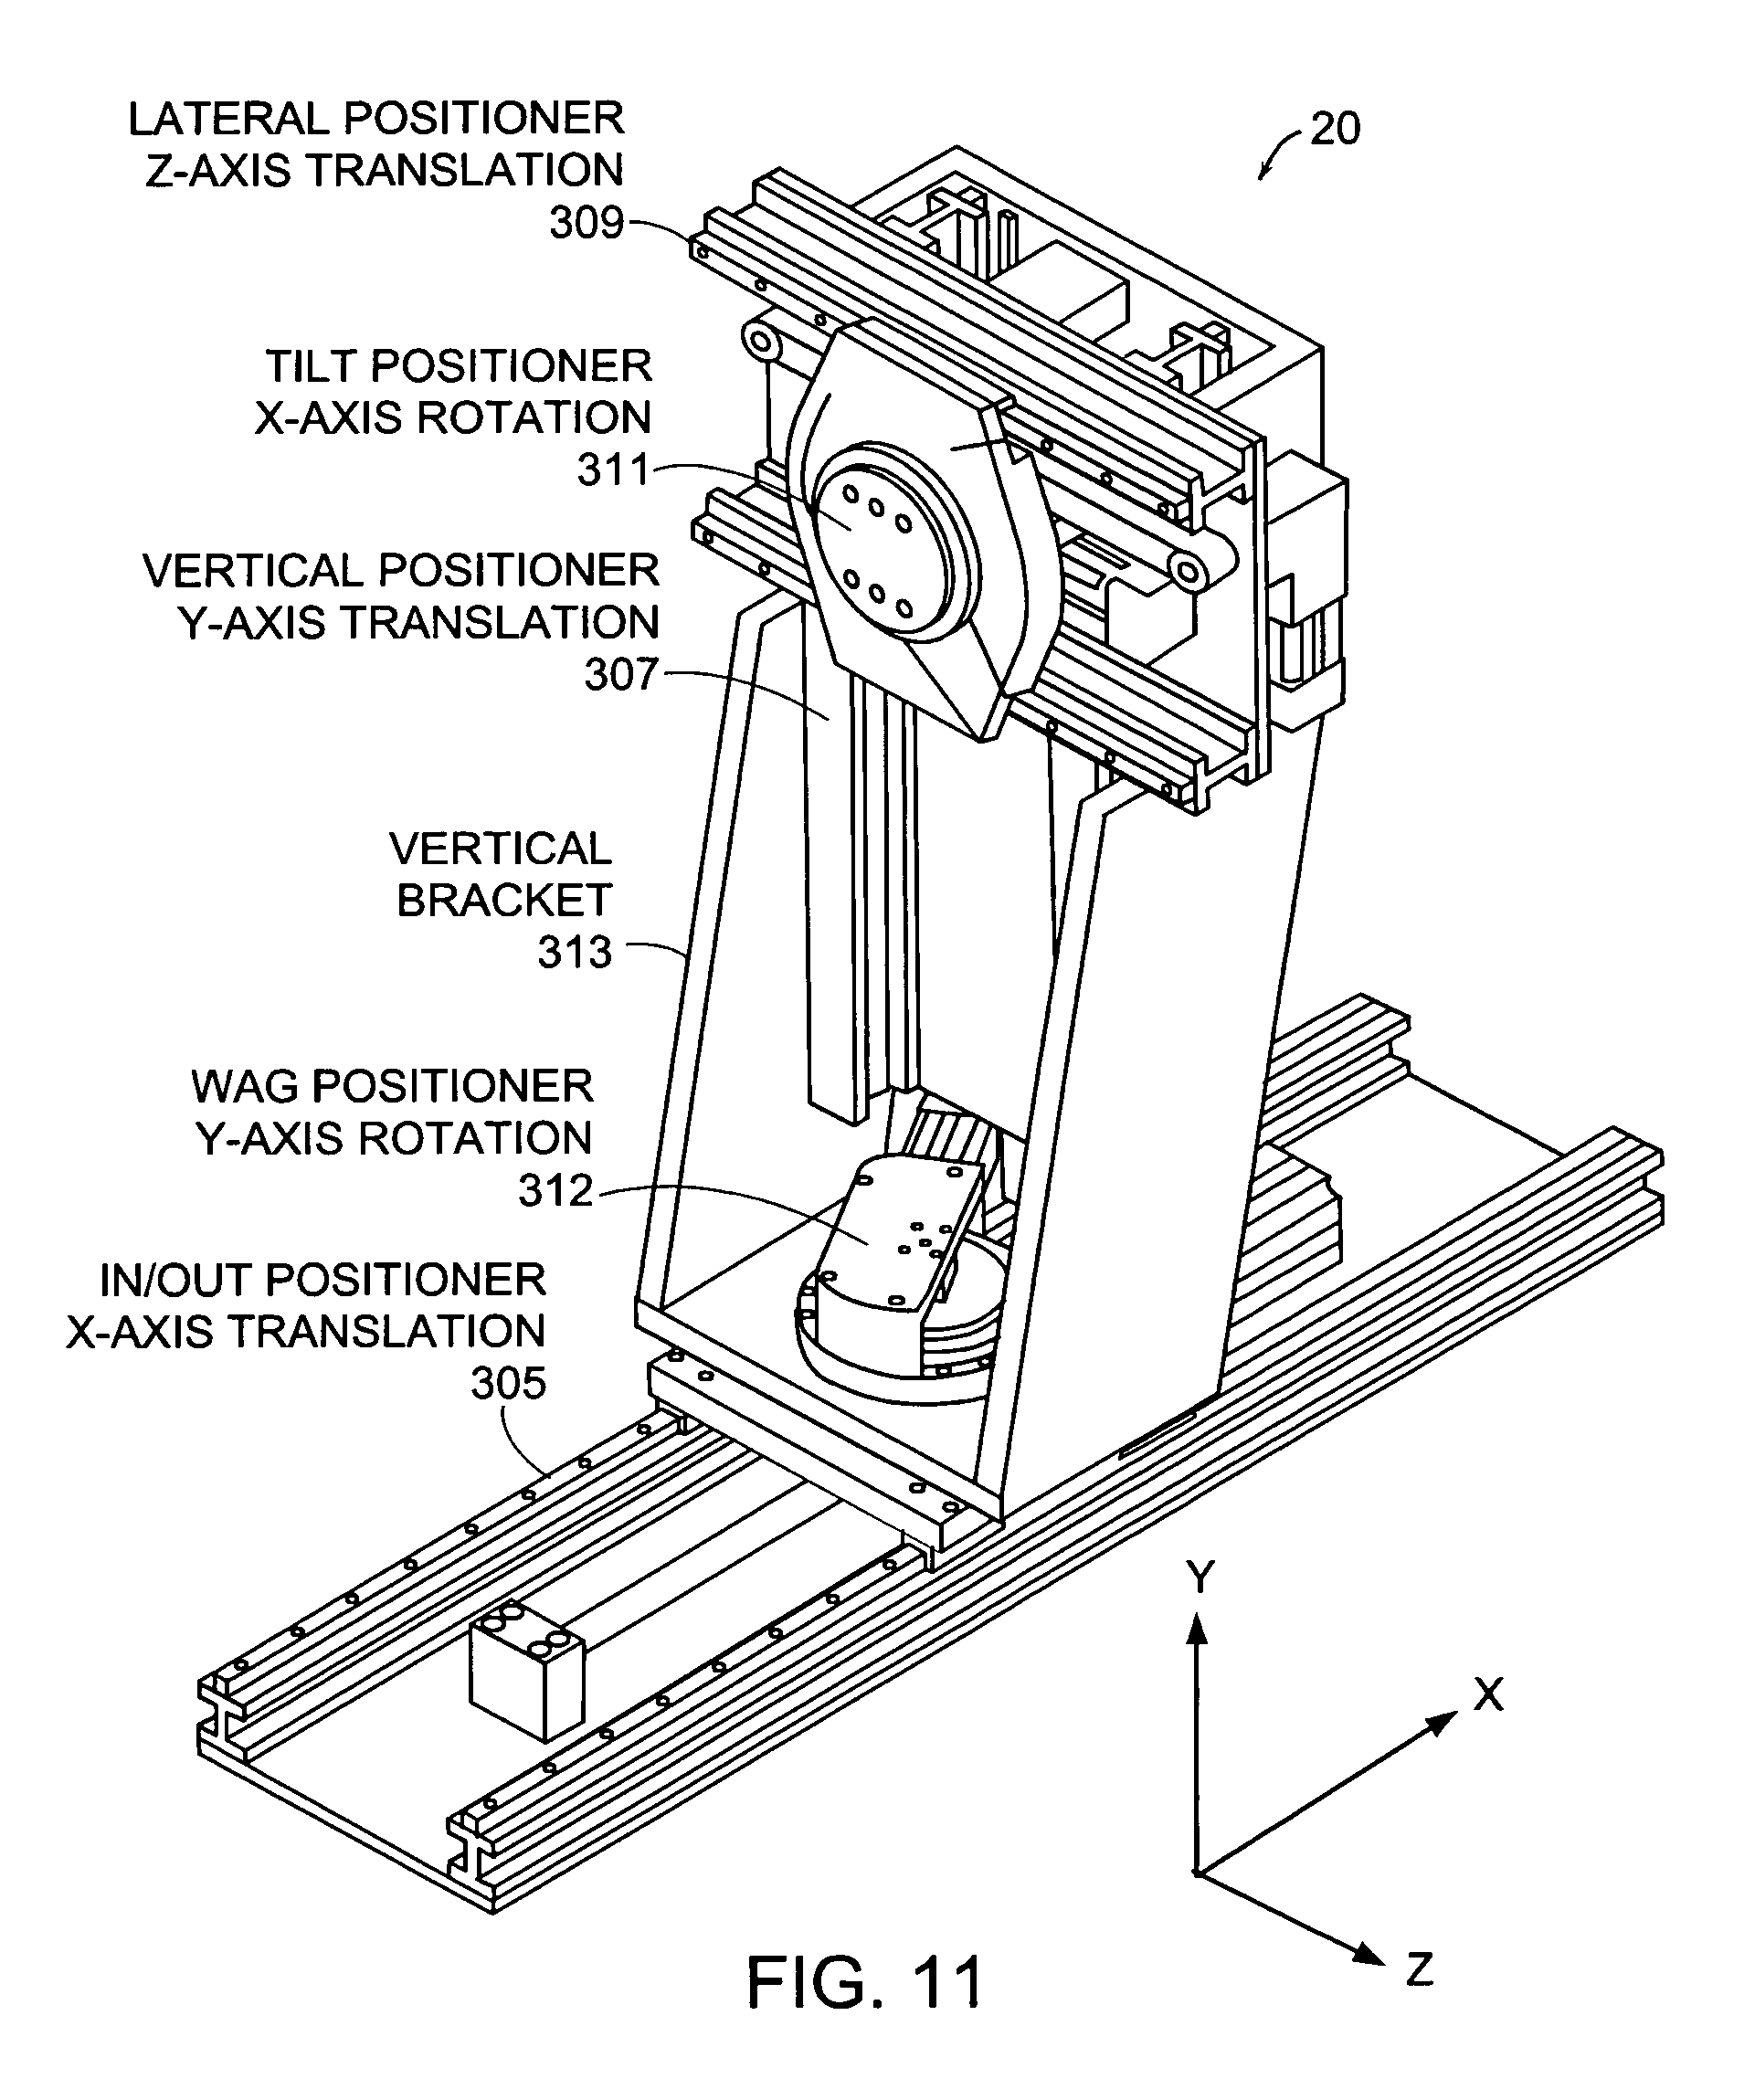 x ray tube rotation and xy rail에 대한 이미지 검색결과